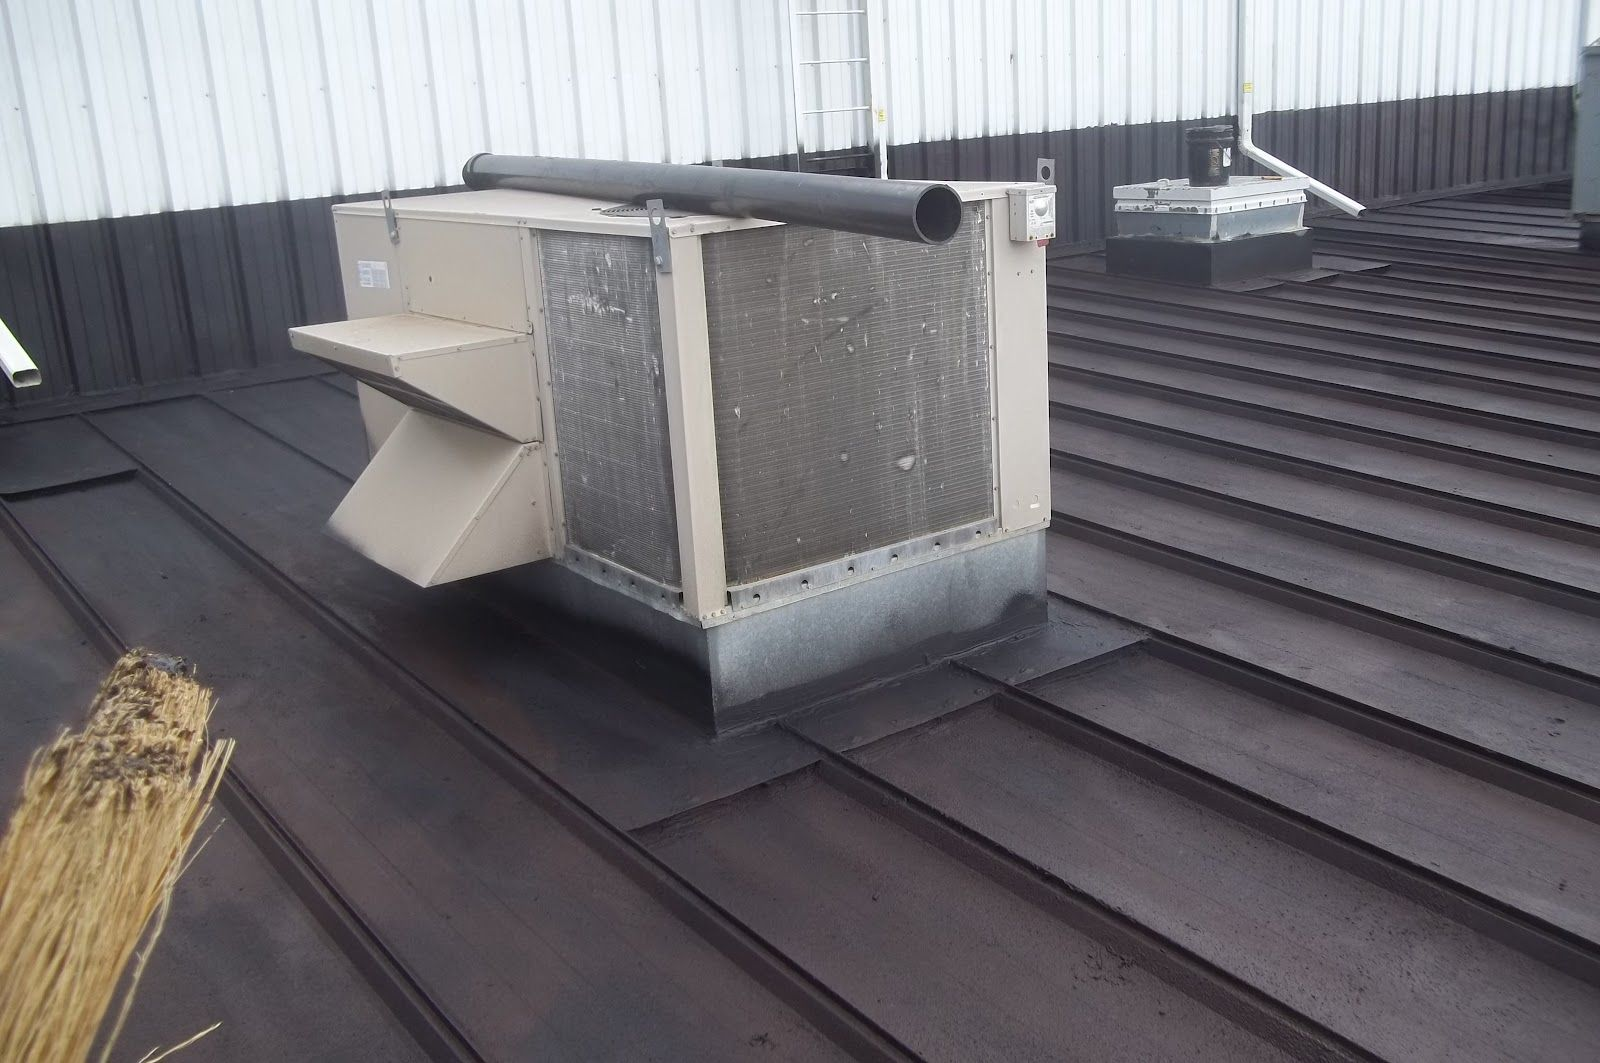 Roof Repair Liquid Rubber Metal Roof Leak Repair Maintenance General Roofing Systems Canada Grs Metal Roof Leaks Liquid Rubber Flat Roof Maintenance